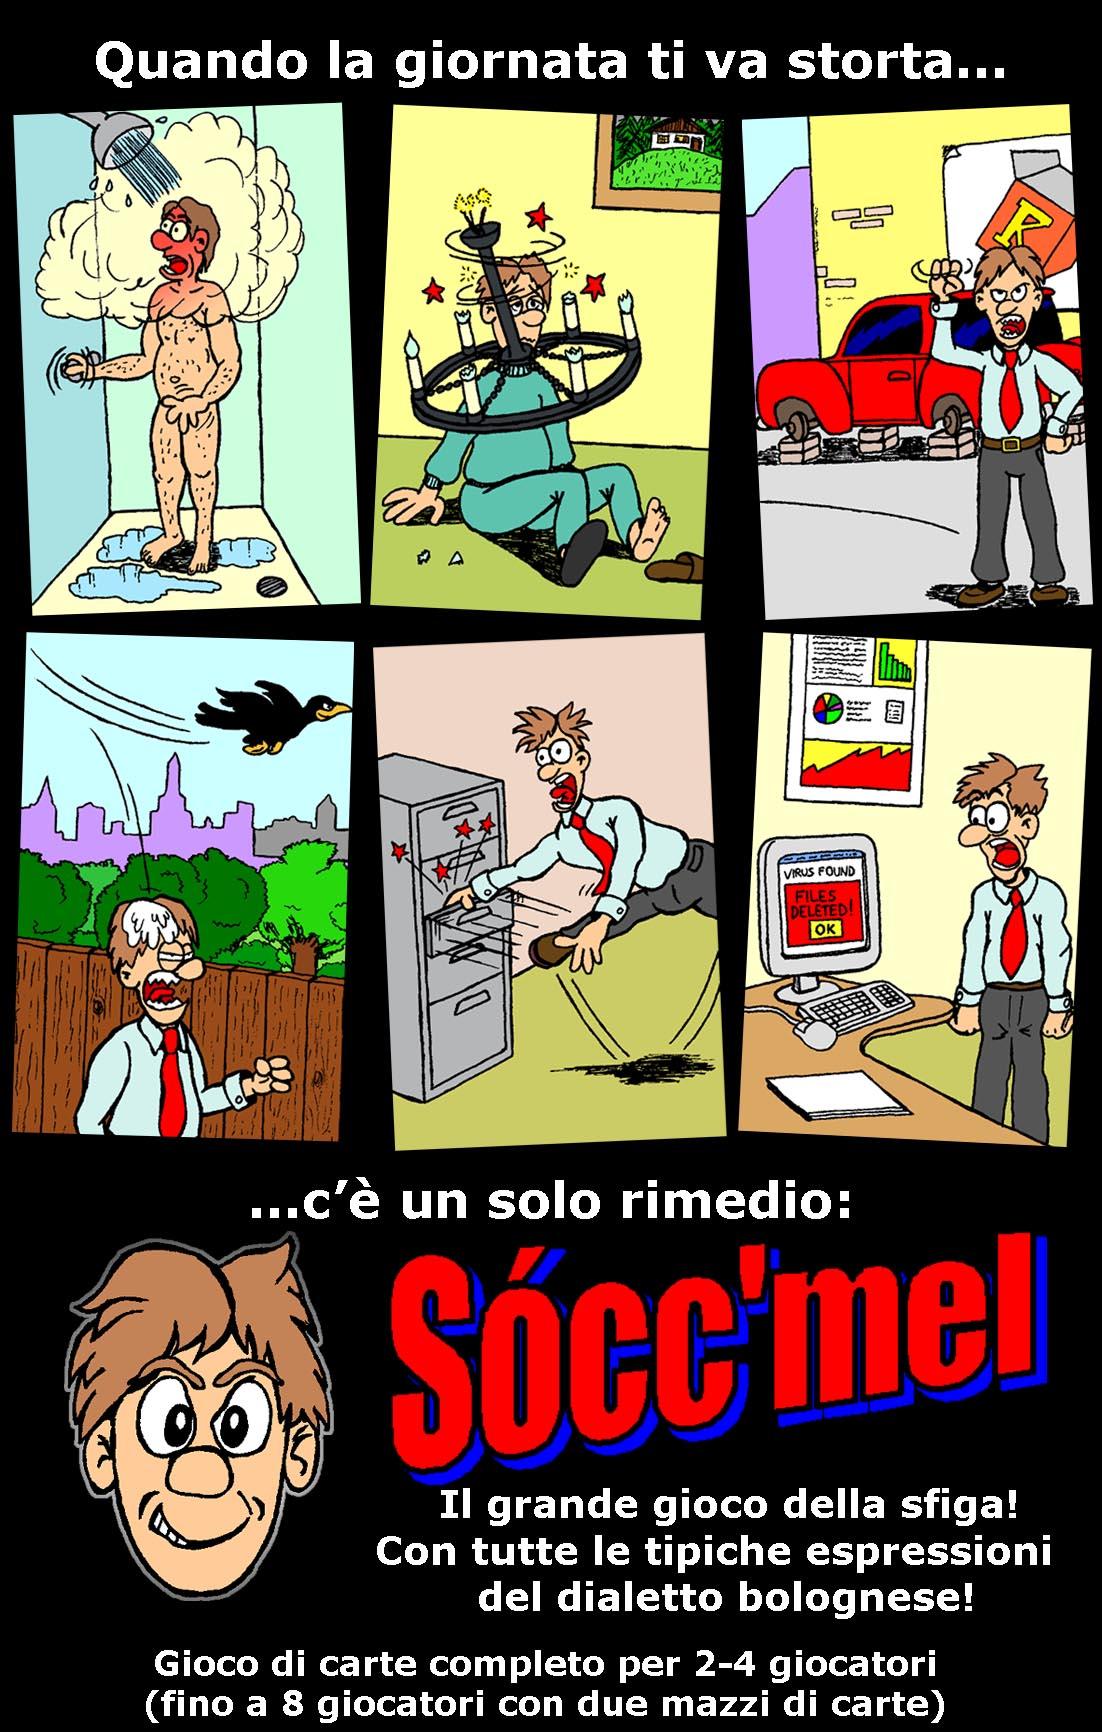 Soccmel.jpg